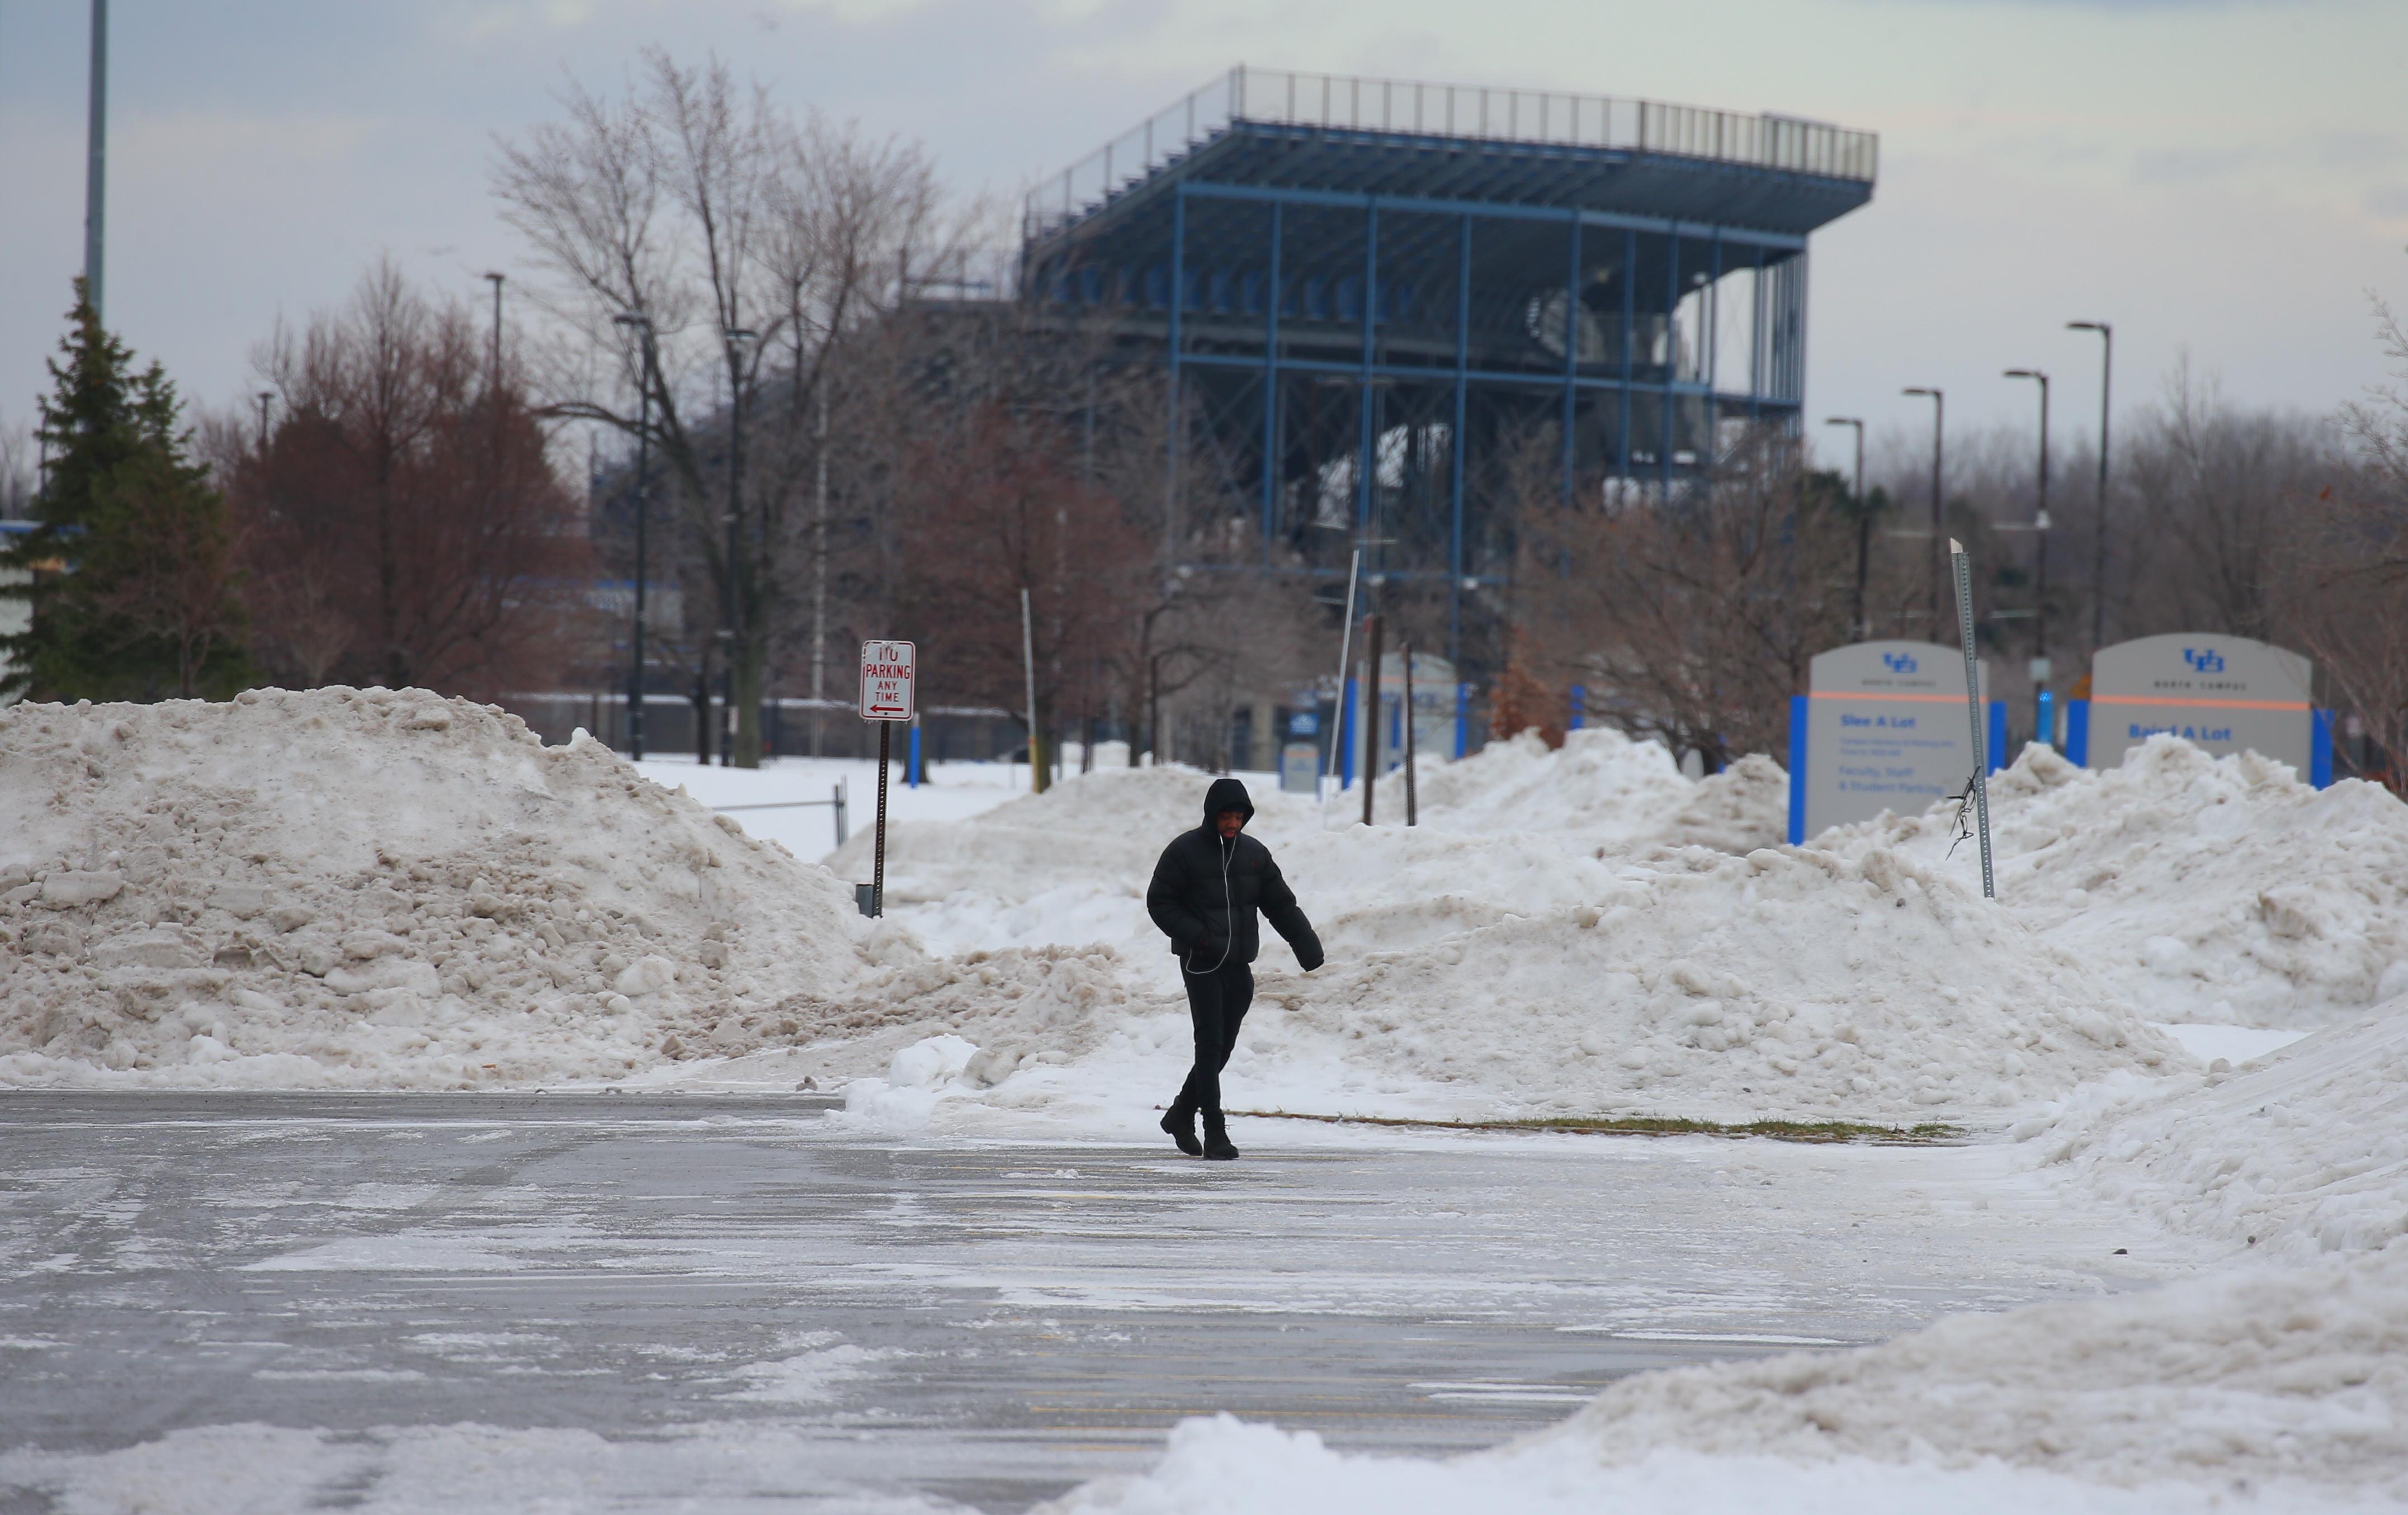 A pedestrian navigates an icy parking lot at the University at Buffalo's Amherst campus on  Sunday,  Dec. 18, 2016. (John Hickey/Buffalo News)